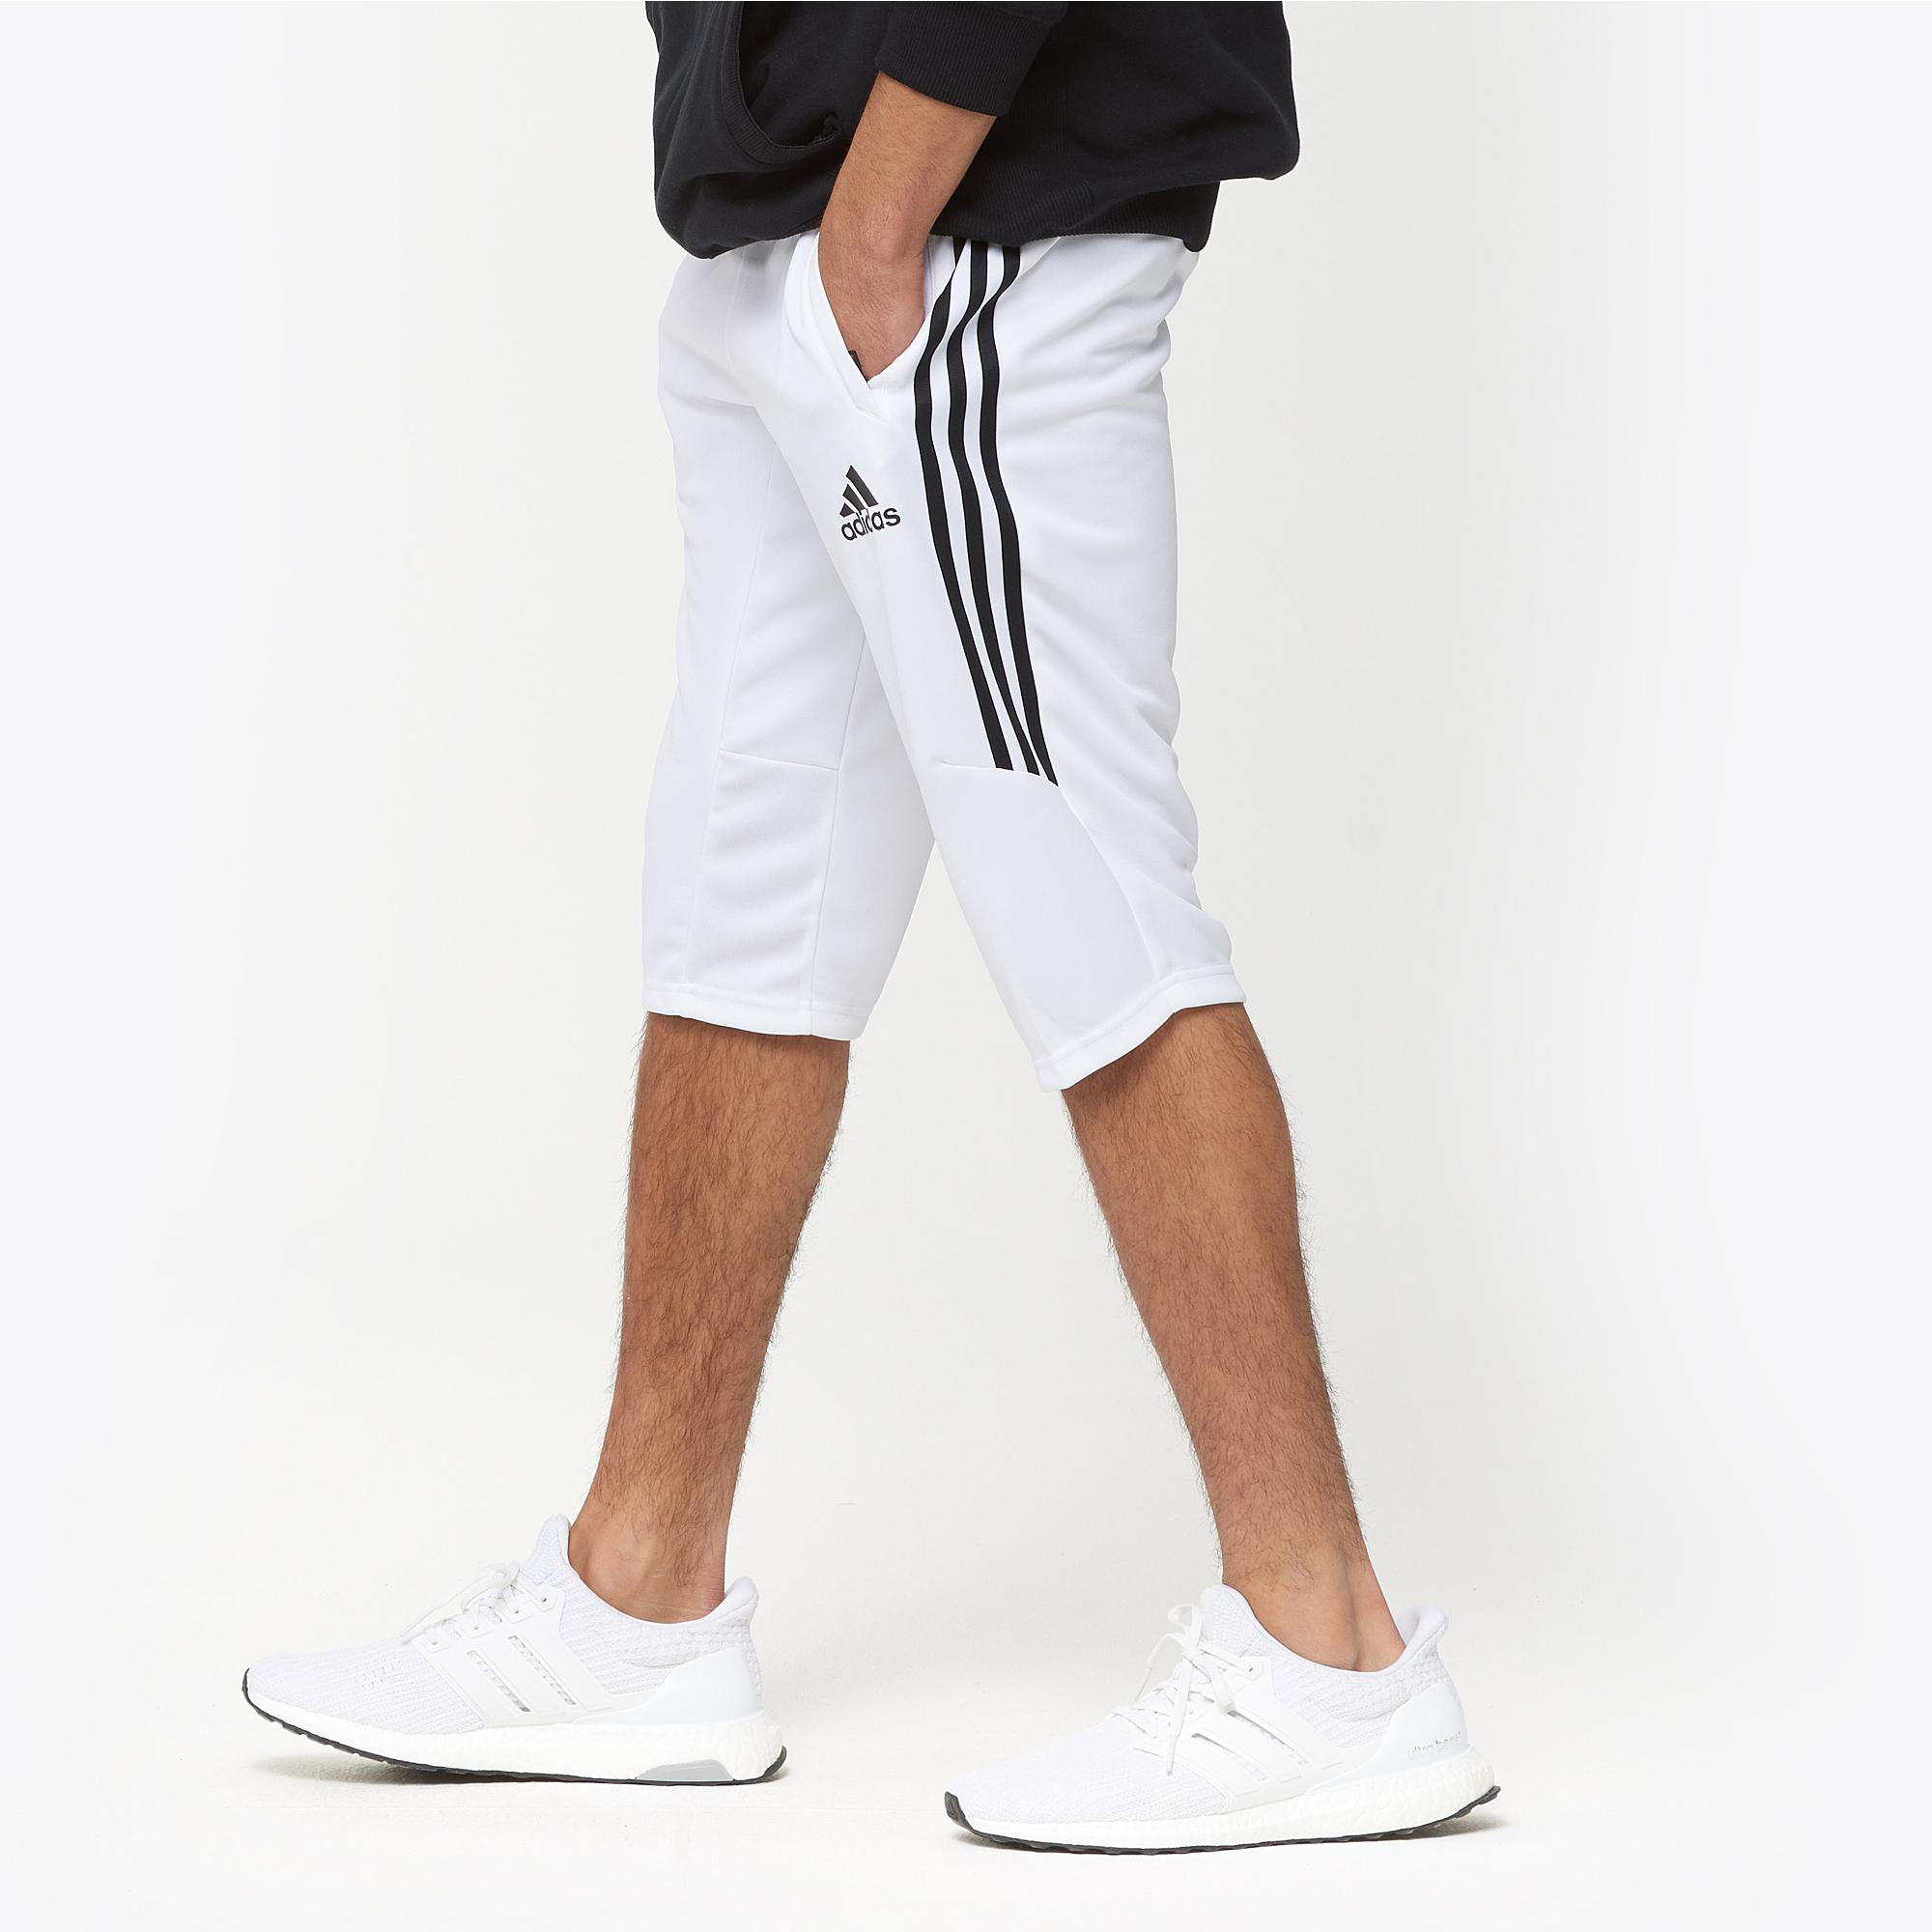 adidas pants 3/4